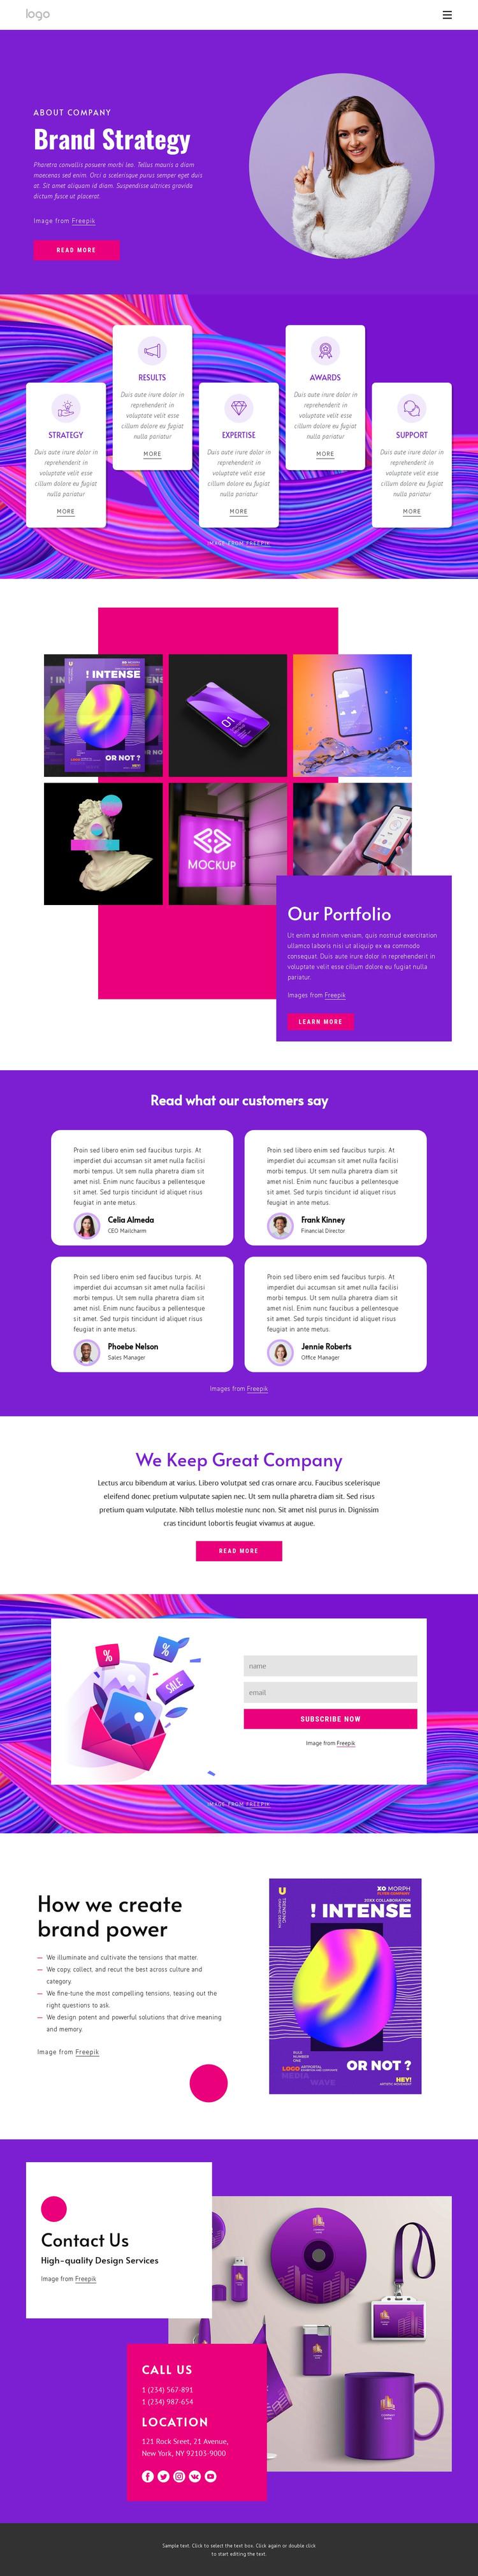 Brand strategy agency Web Design